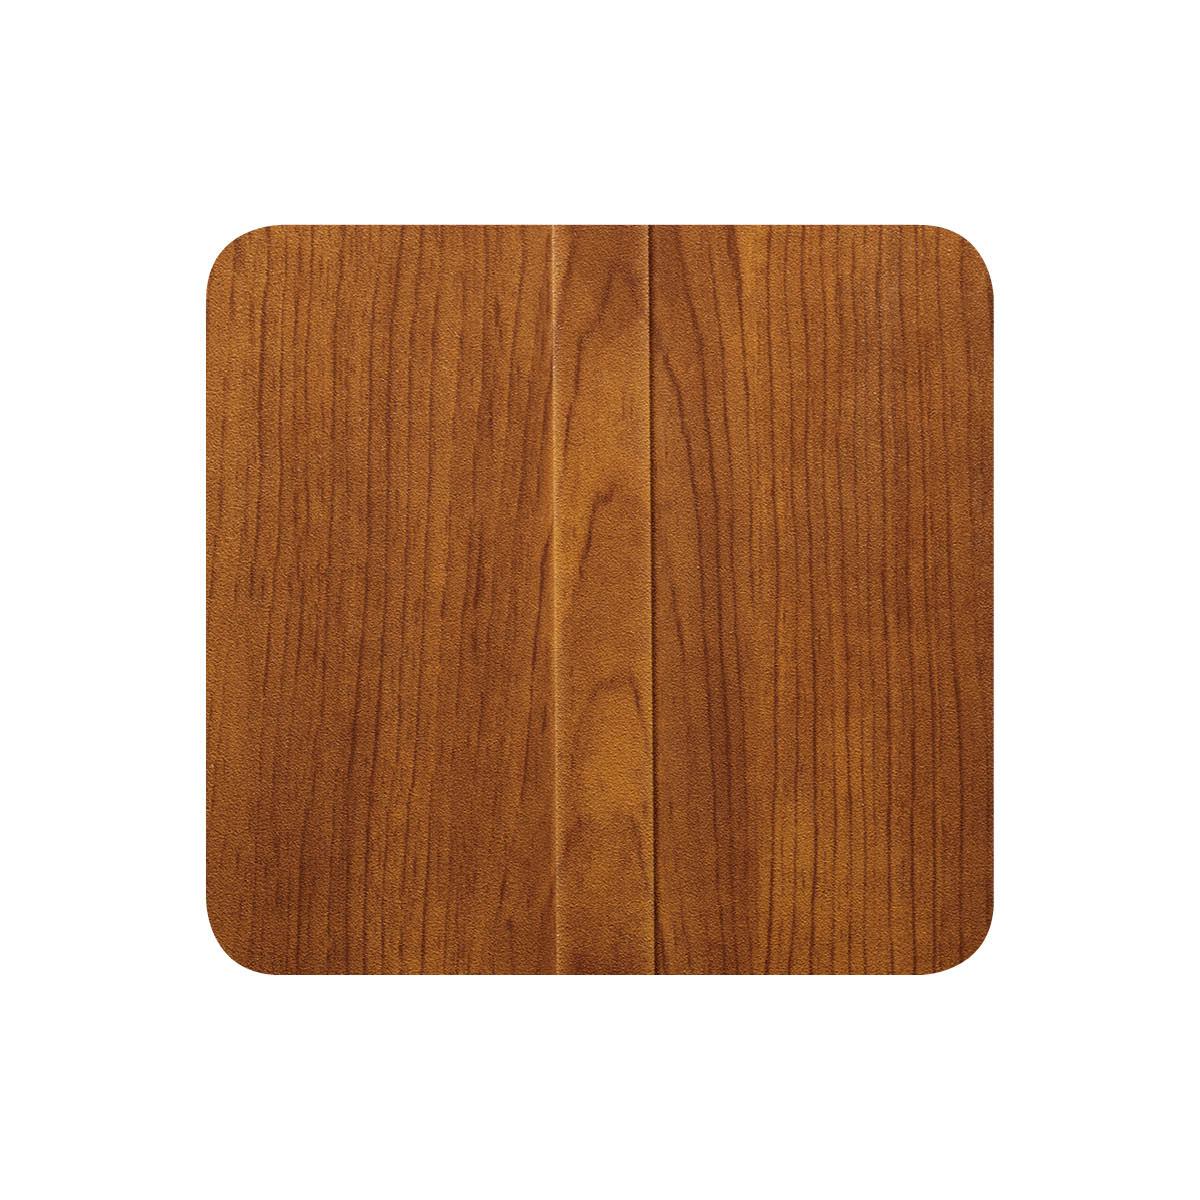 Mediterranean cherry metal based wood alternative finish sample.